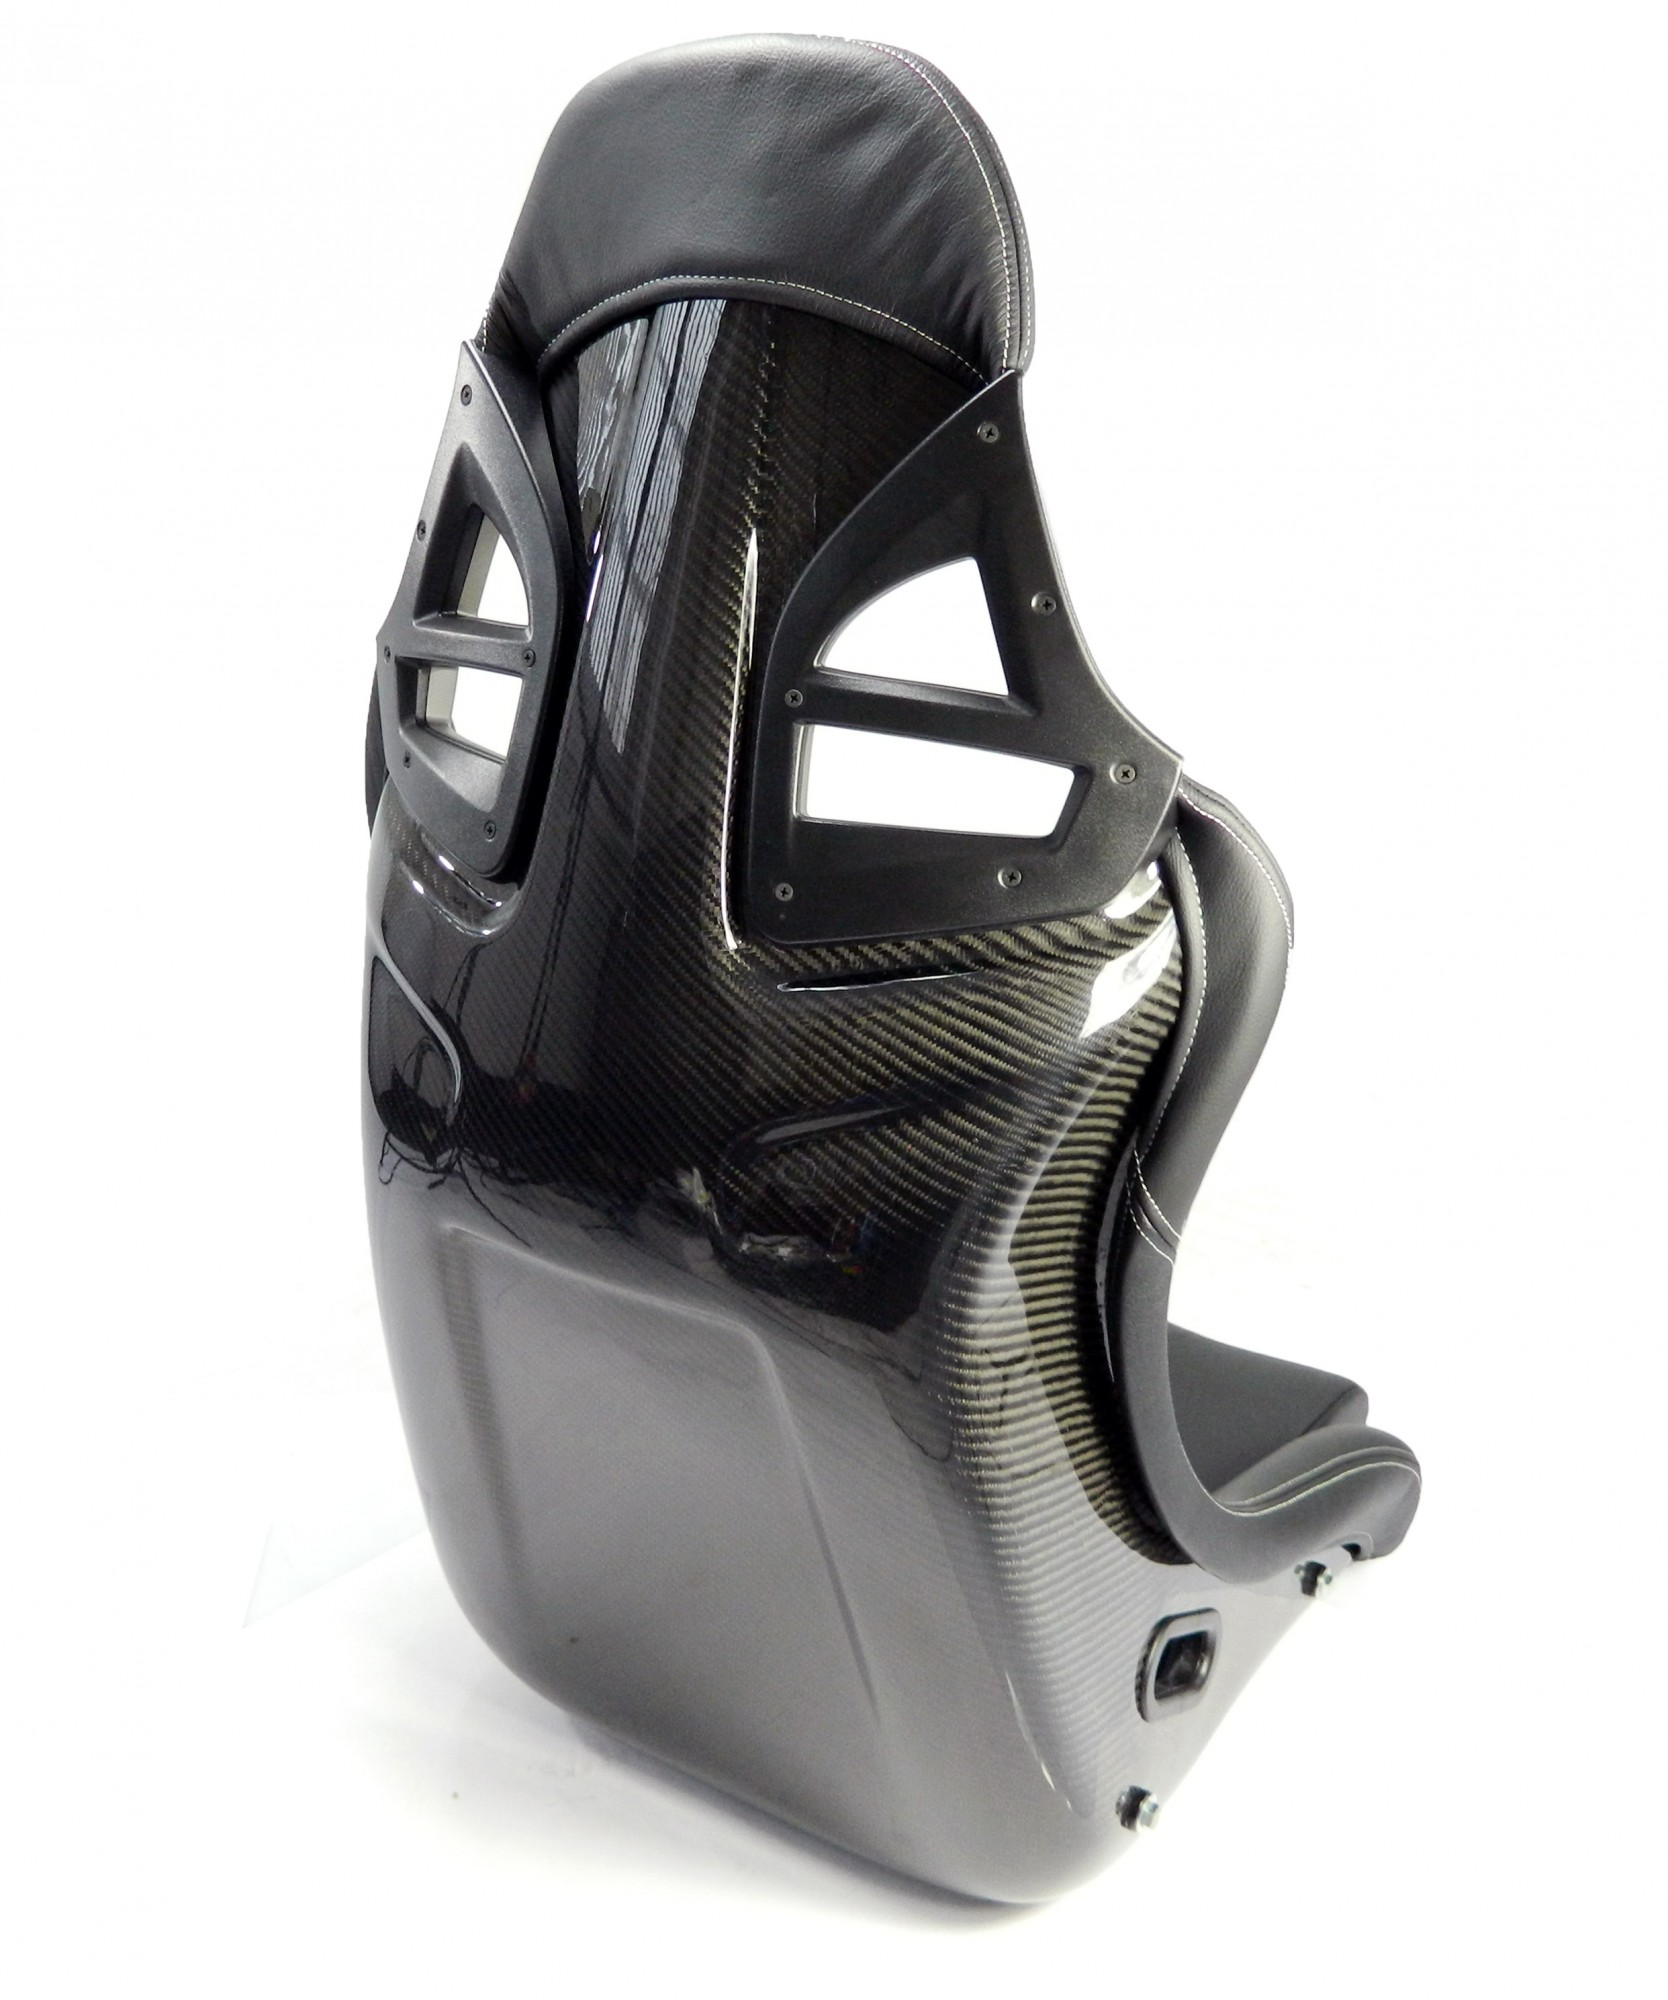 2x Carbon Sportsitz 997-GT3-Optik Leder schwarz + Konsole & Laufschiene